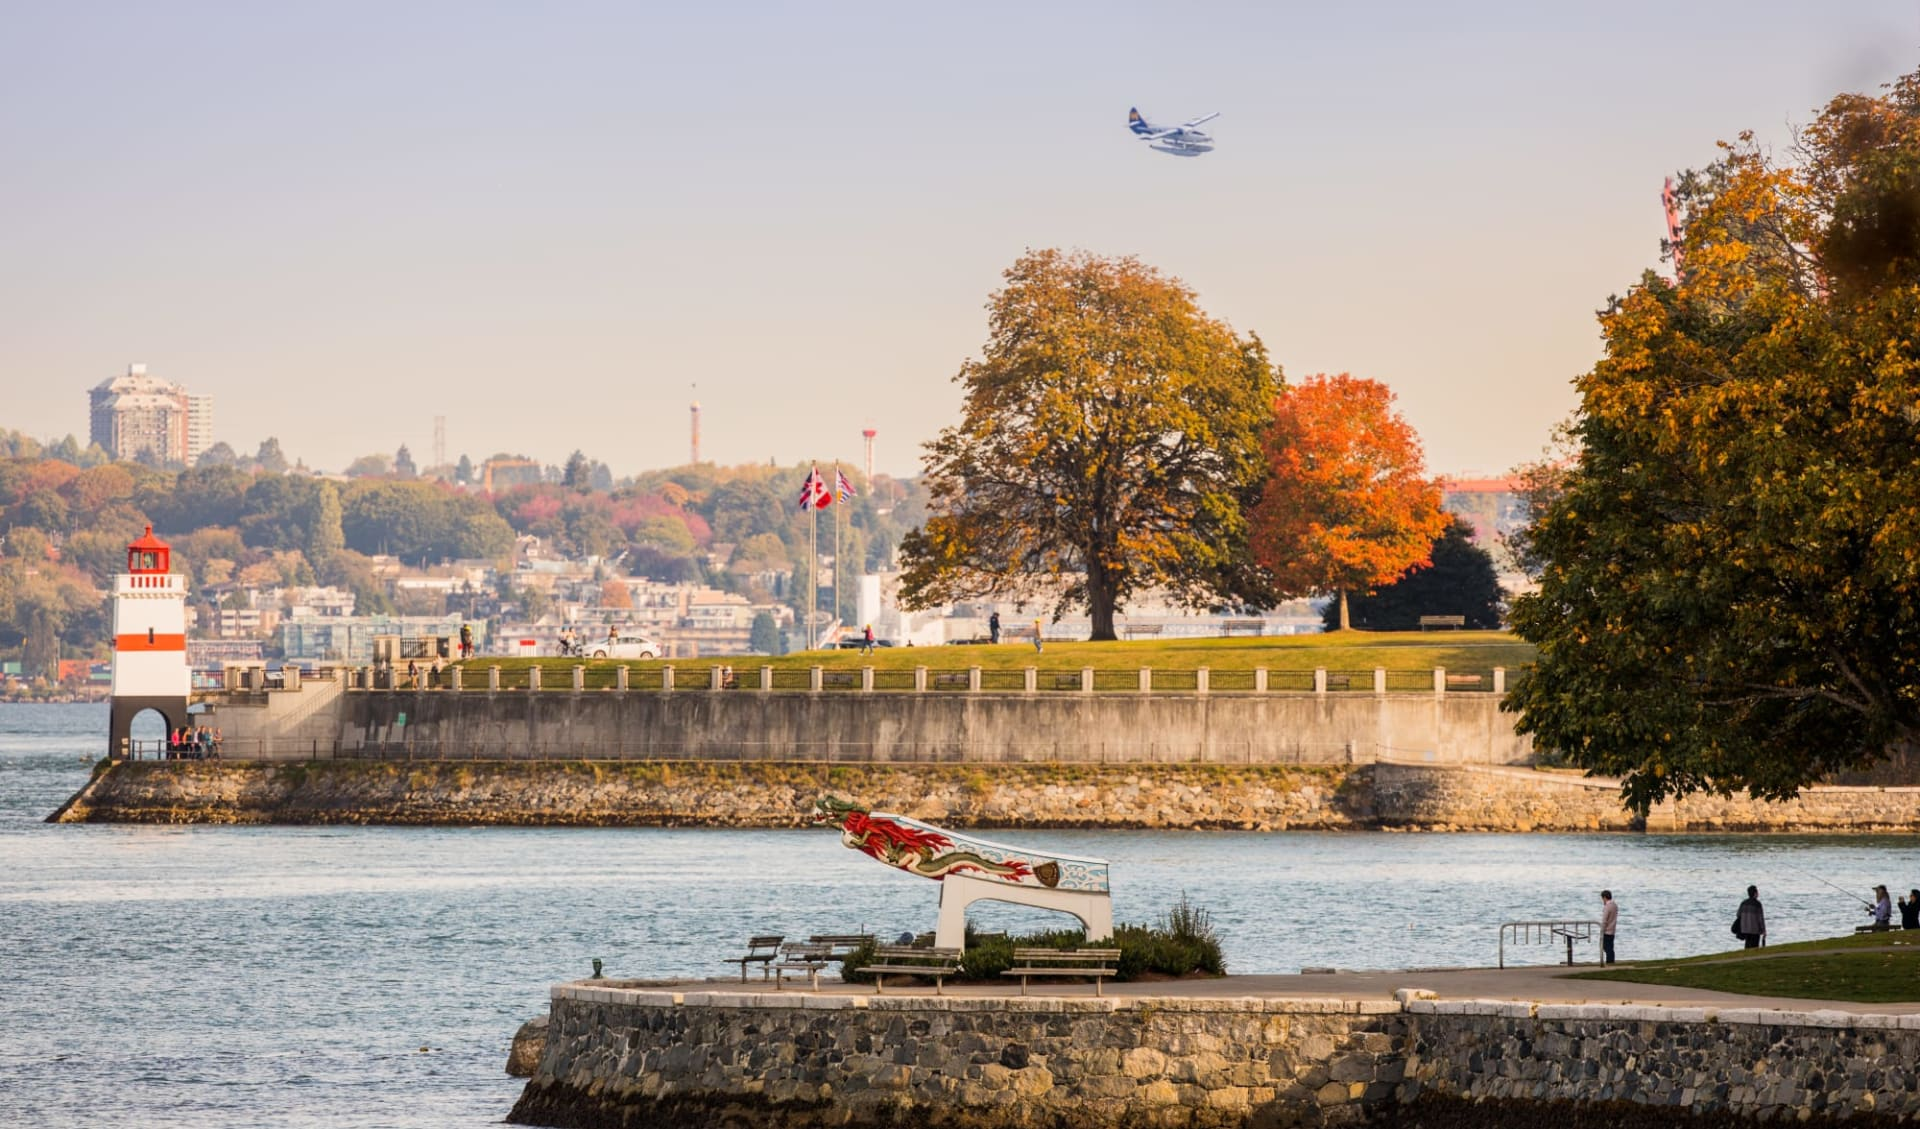 Höhepunkte Westkanadas ab Vancouver: Canada - British Columbia - Vancouver - Stanley Park Brockton Point